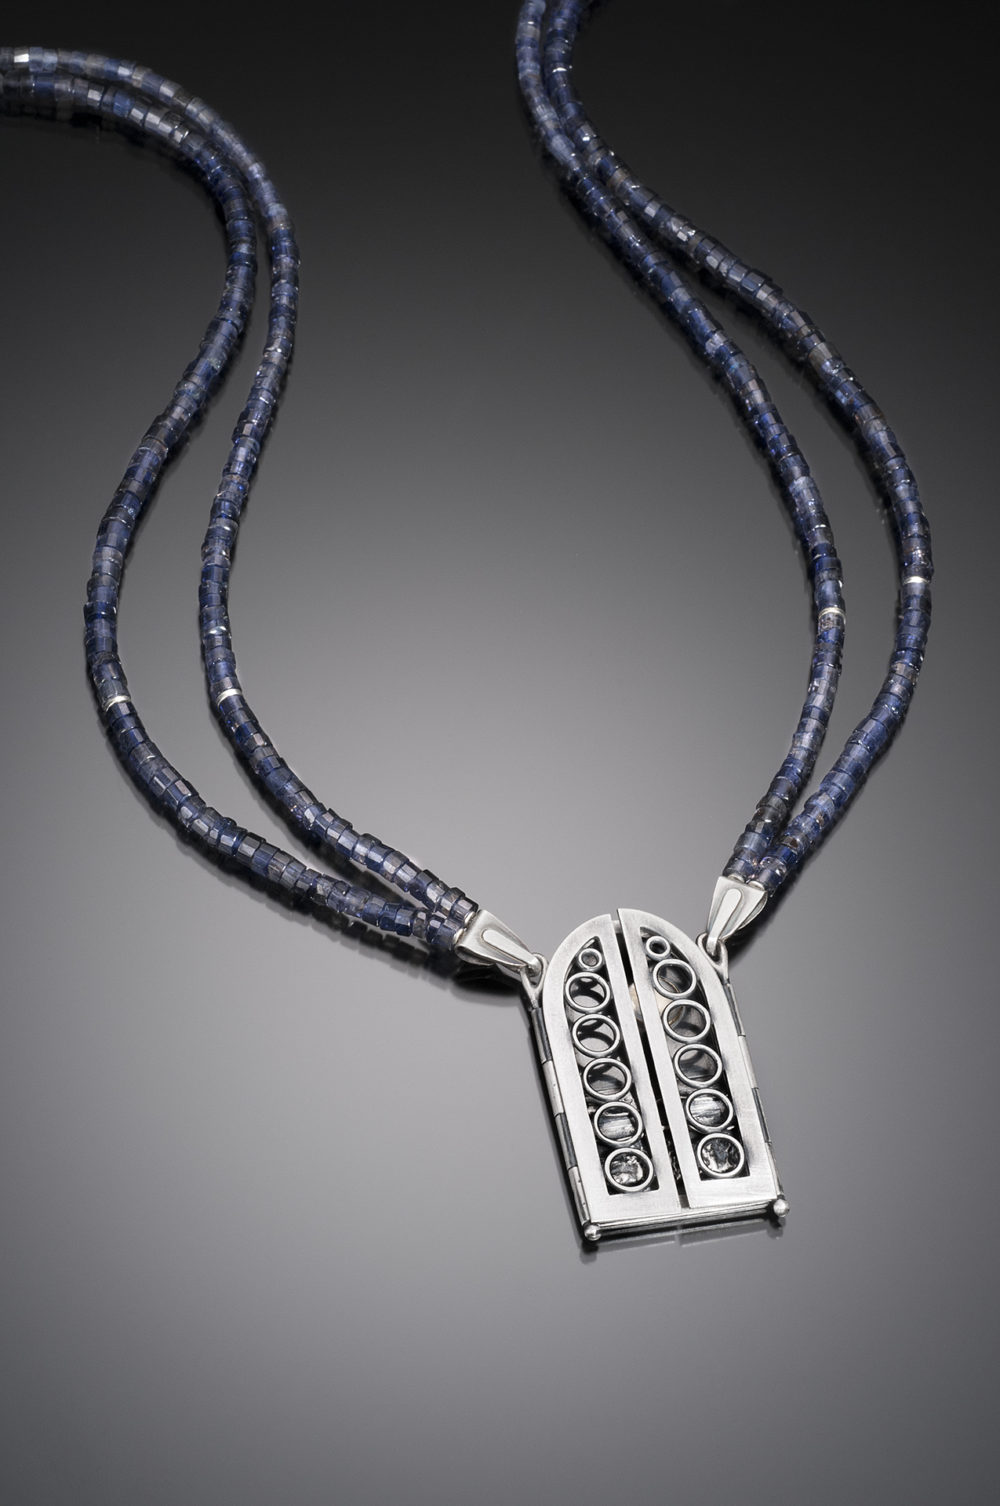 NISA Jewelry Moonlit Ocean Necklace, closed